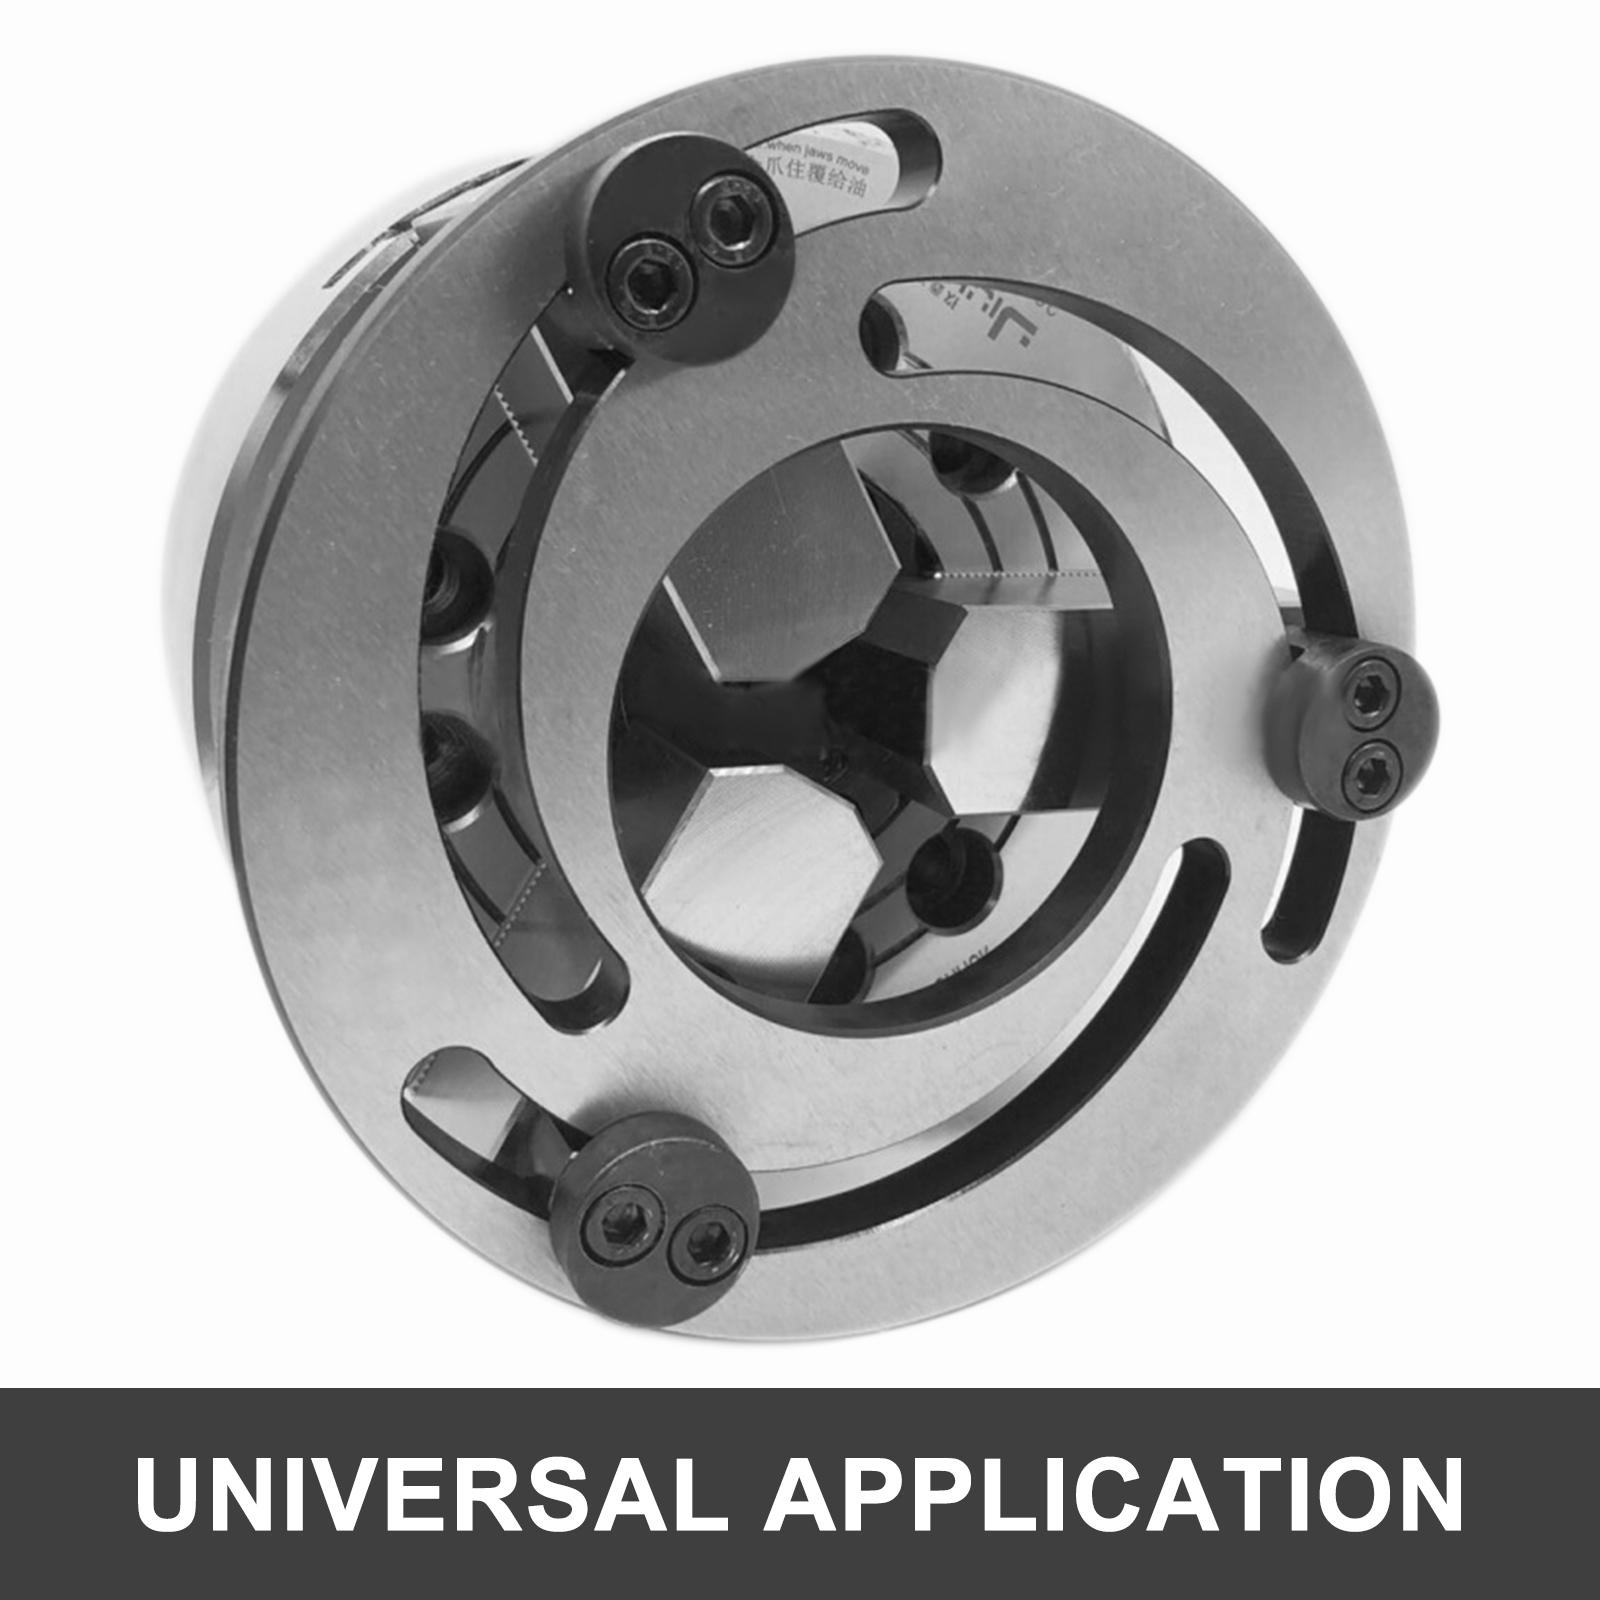 Jaw Boring Ring Chuck Hydraulic Pressure Claw US Ship CNC HighQuality Adjust